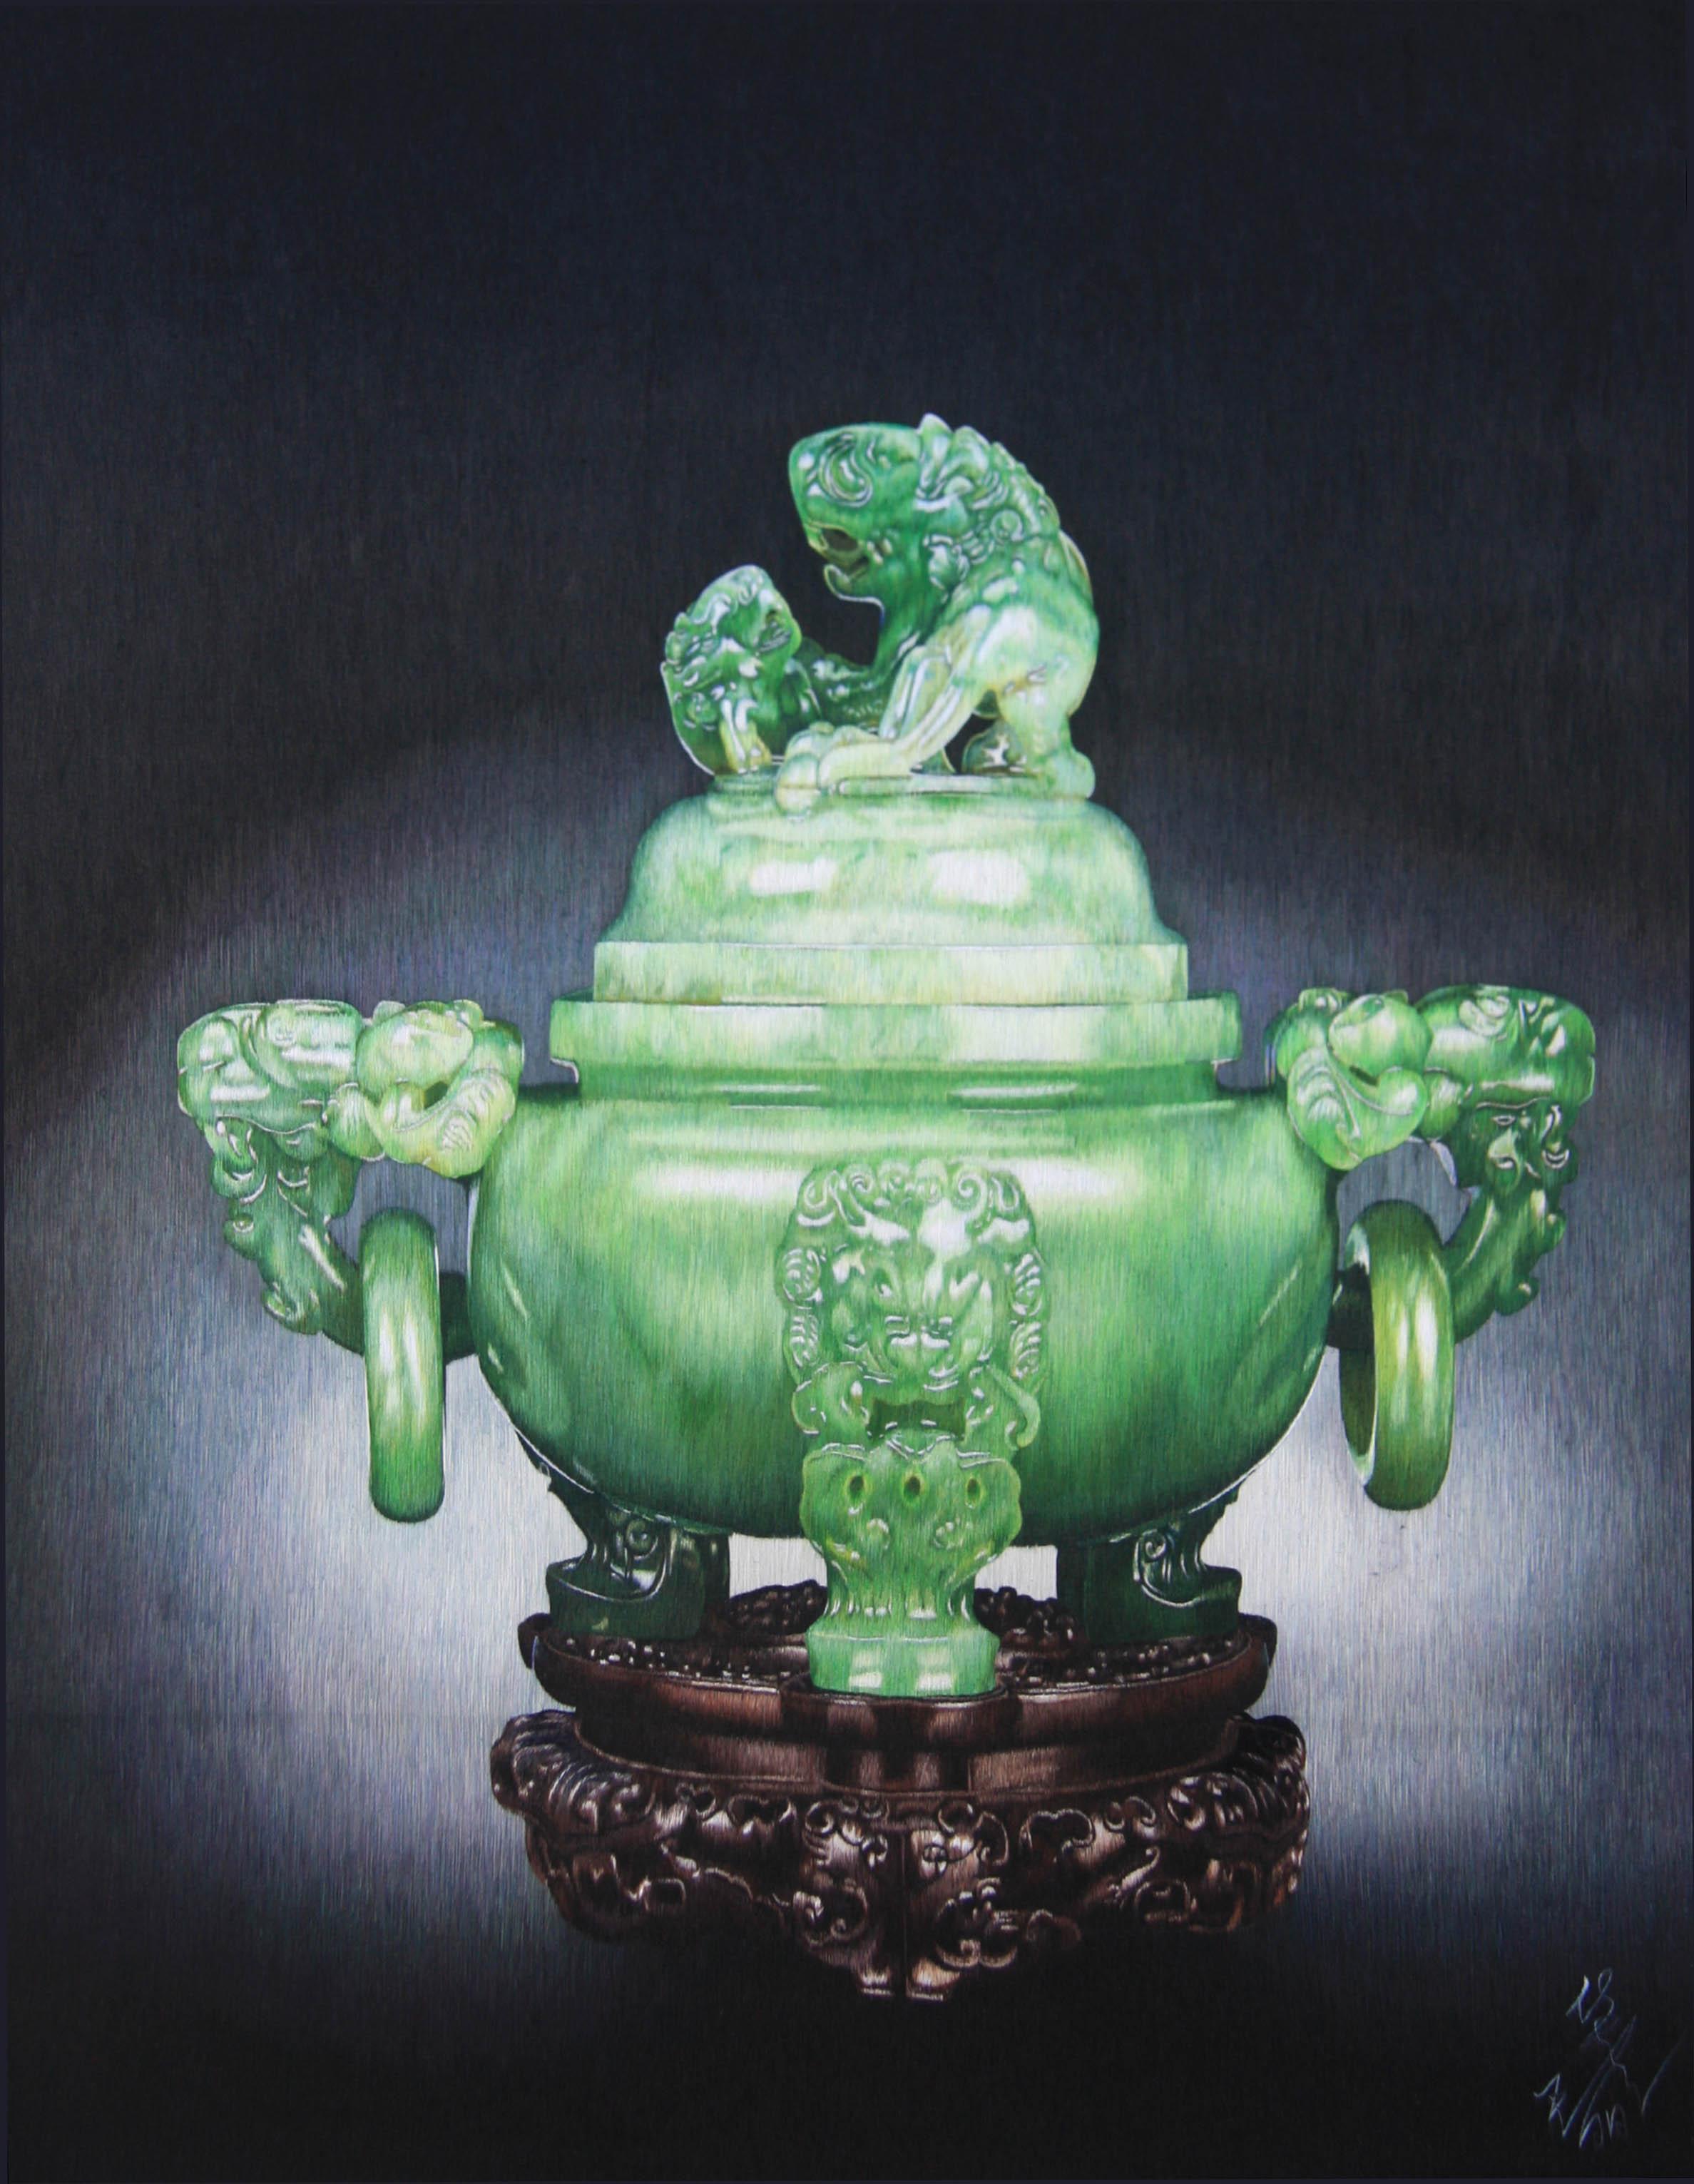 Jade Incense Burner with Dragons <br> 翠玉双龙炉